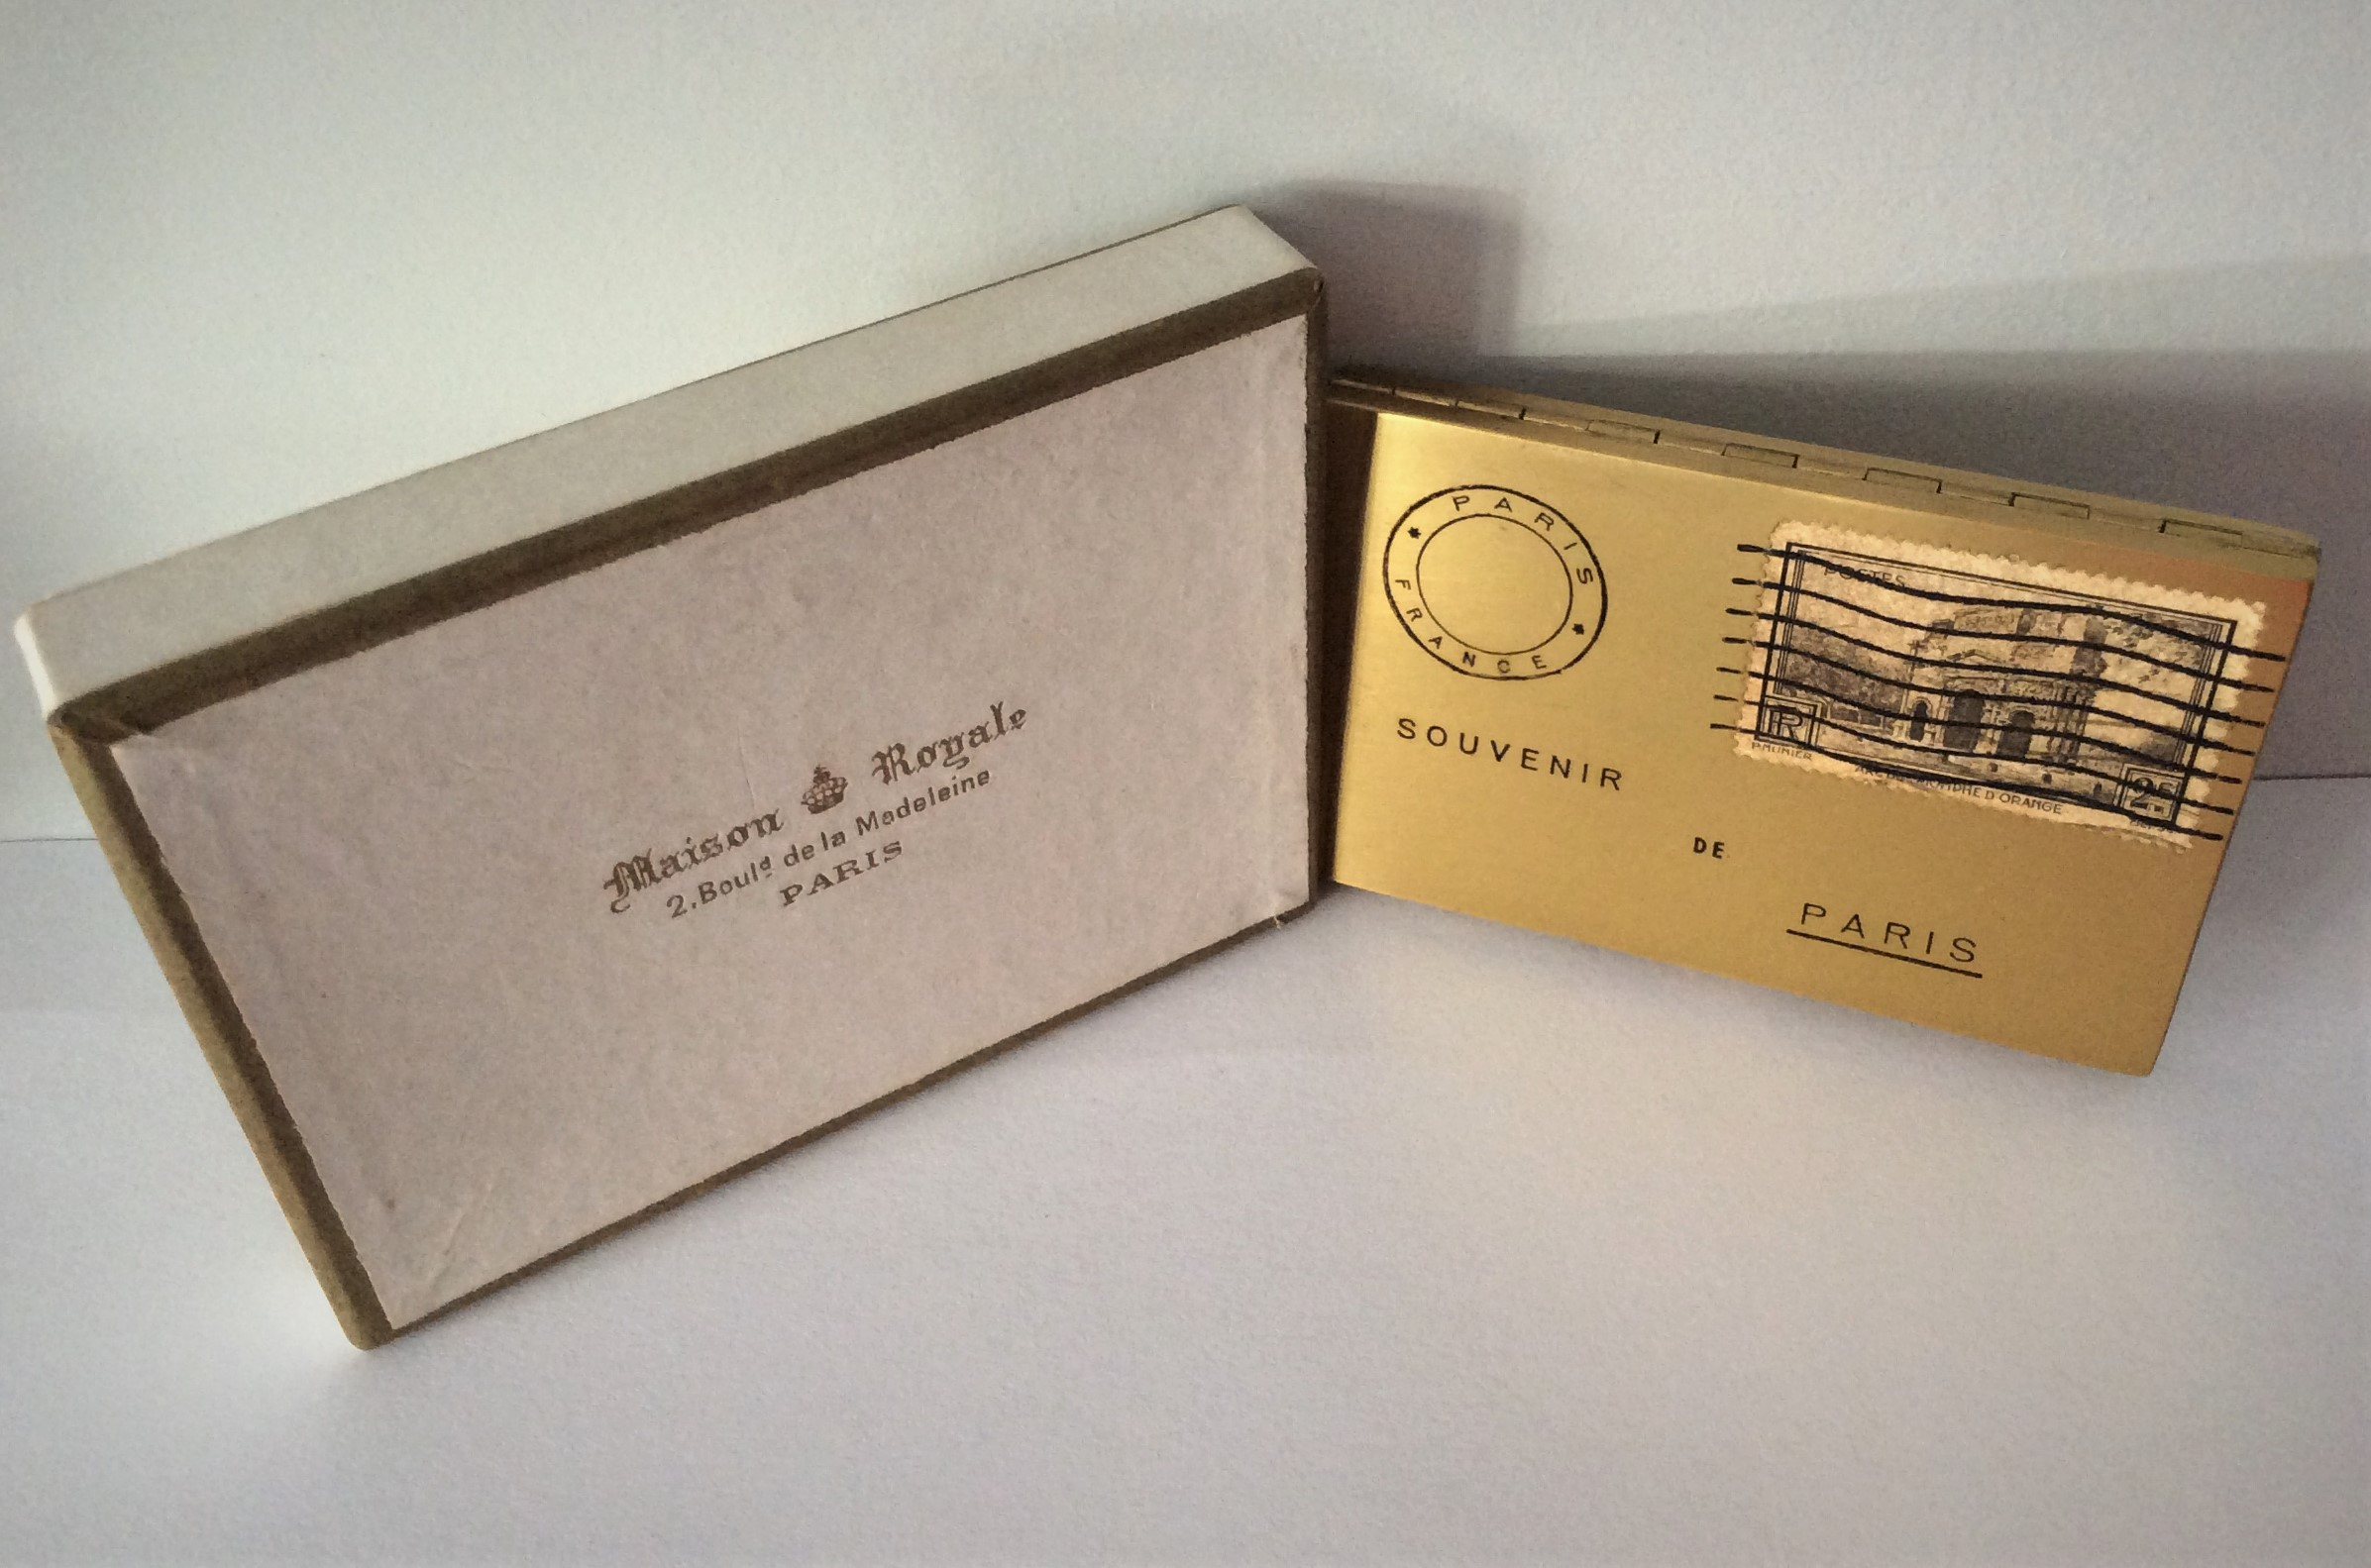 Rare Vintage Unused SOUVENIR DE PARIS Envelope Powder Compact with 1938 2f Postage Stamp